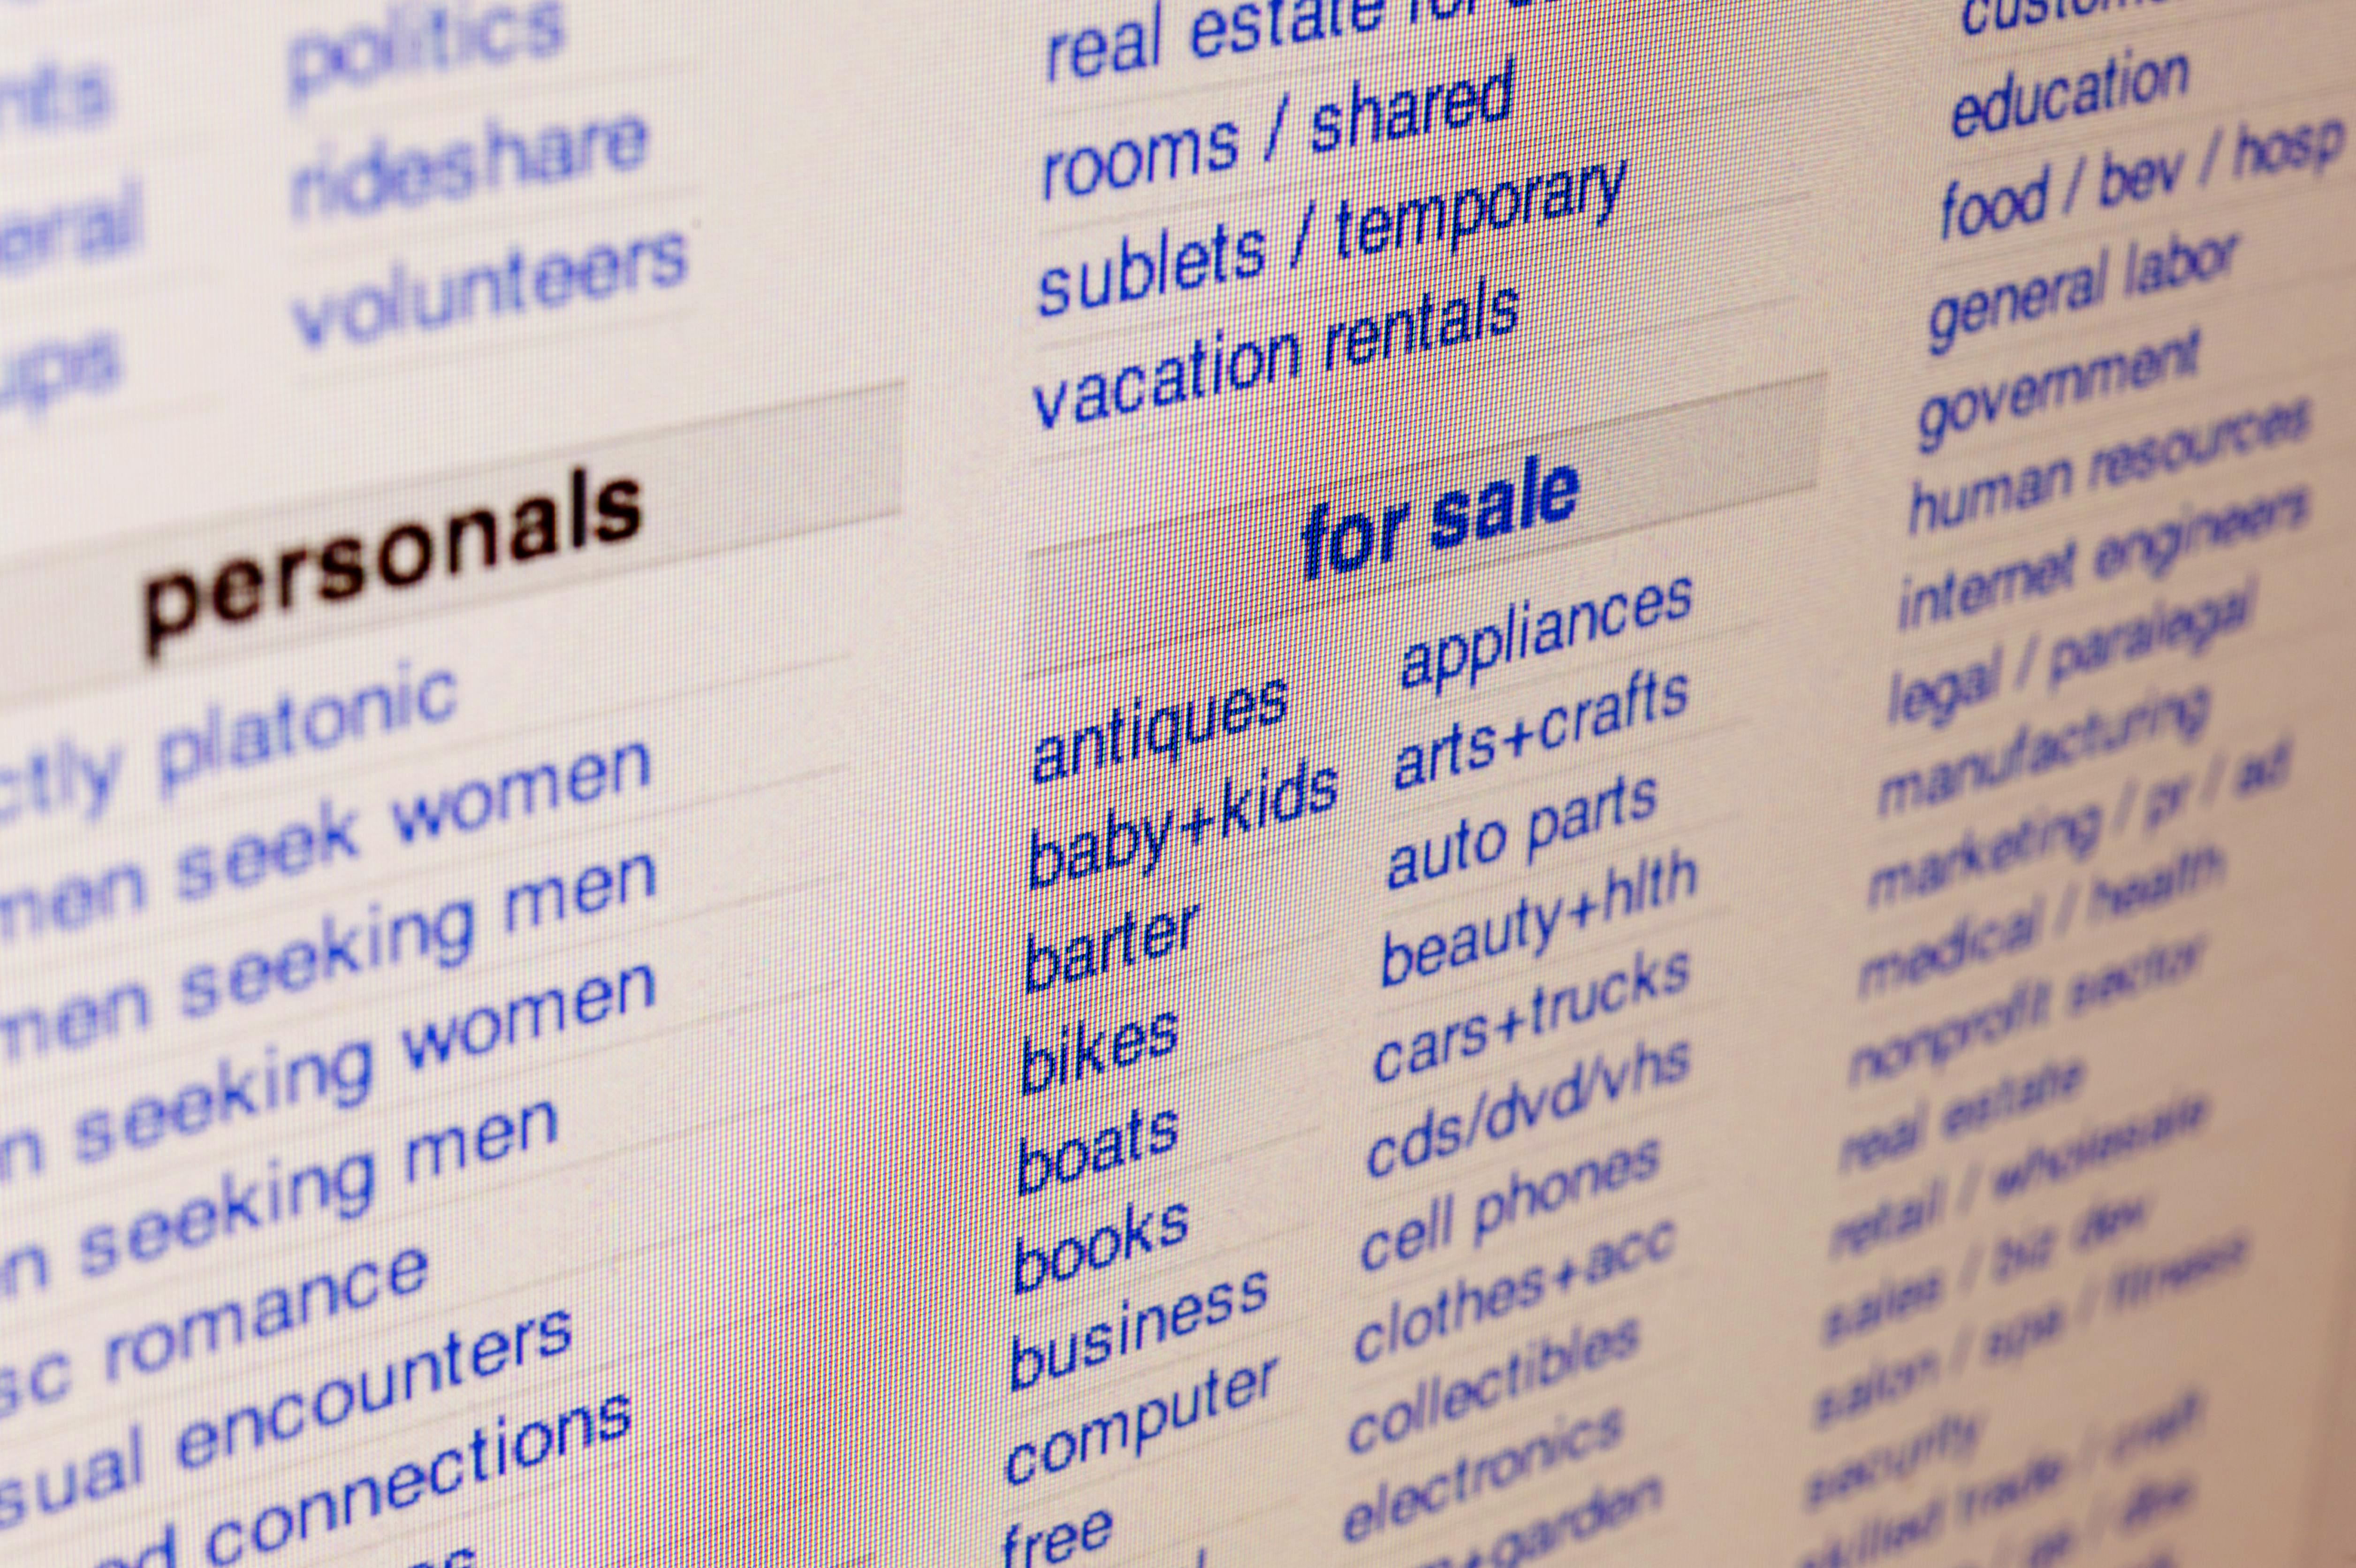 Craigslist erotic services los angeles review